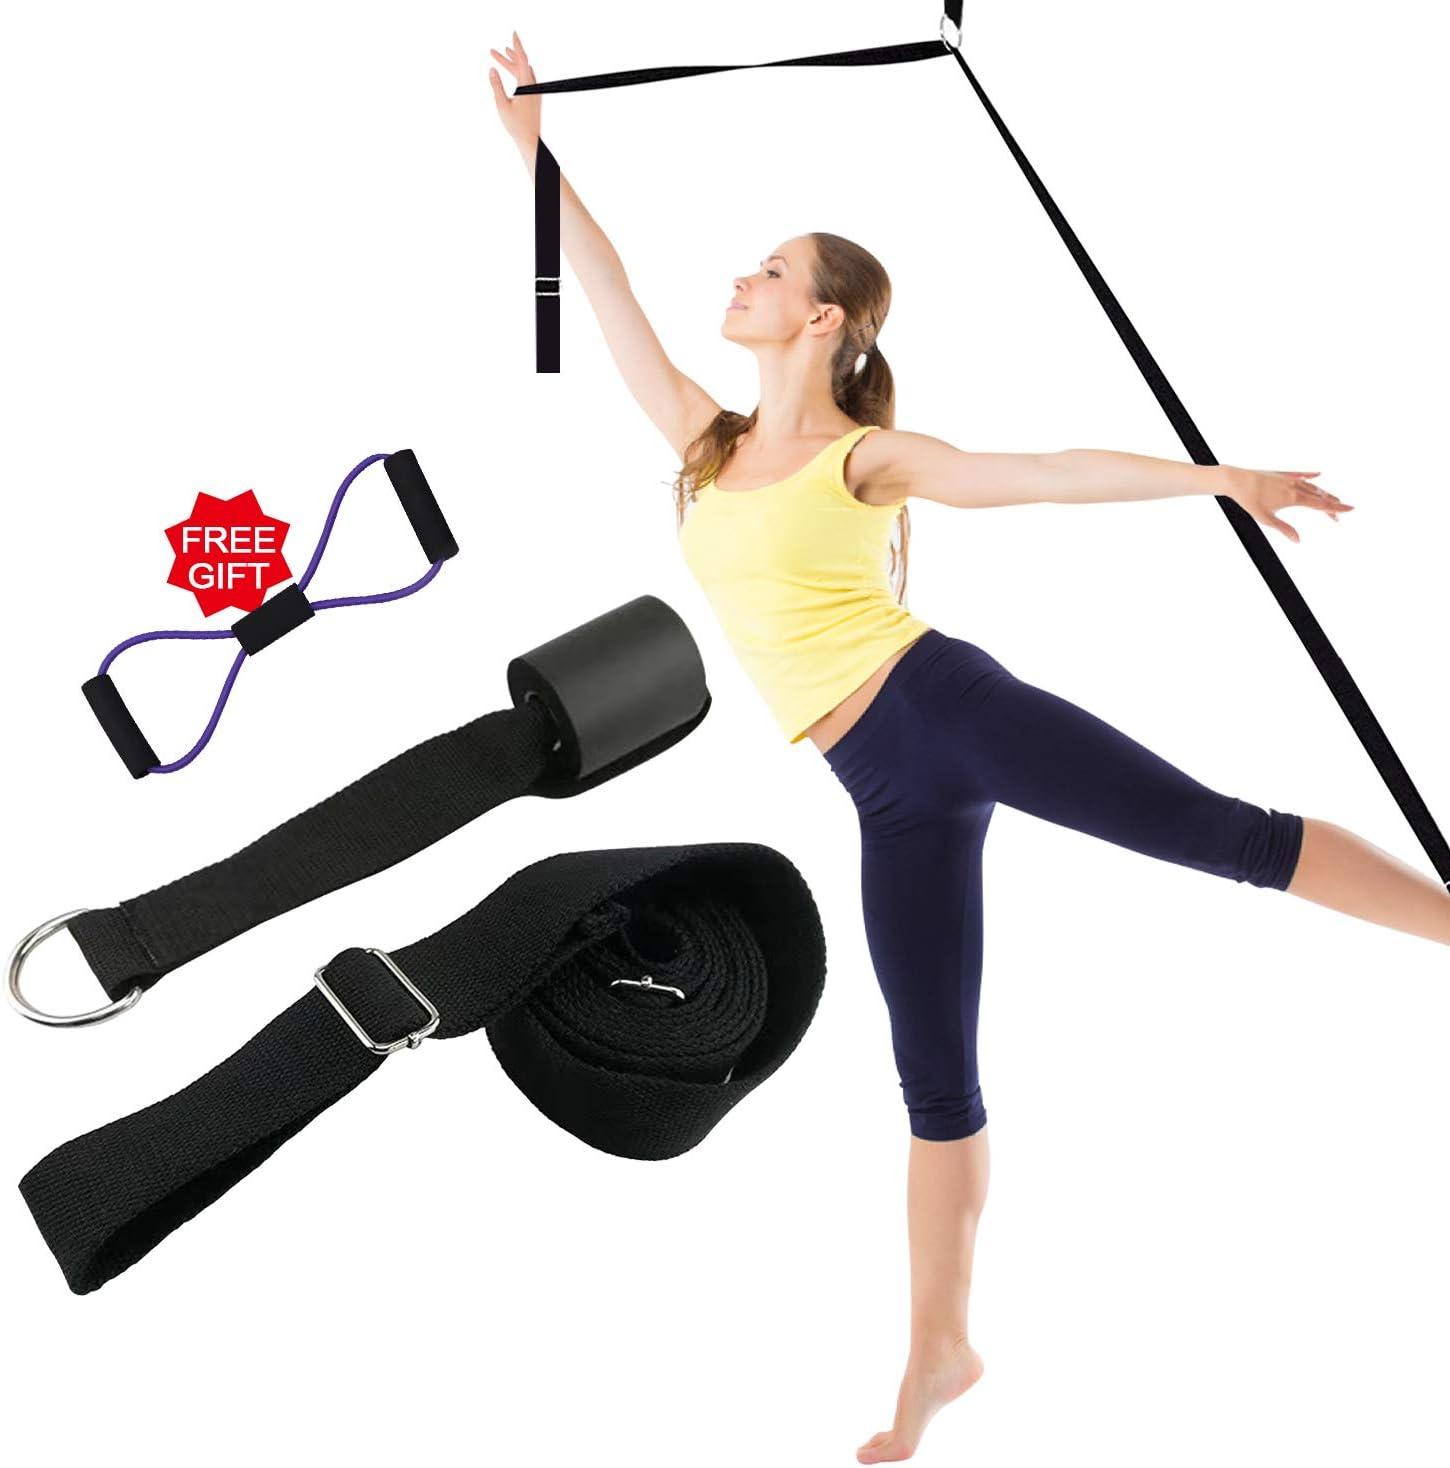 Door Flexibility Stretching Leg Strap Door Stretch Strap for Flexibility /& Splits Trainer,Great Equipment for Dance Ballet Cheer Gymnastics Taekwondo Yoga Pilates Stretching NDGDV Leg Stretcher